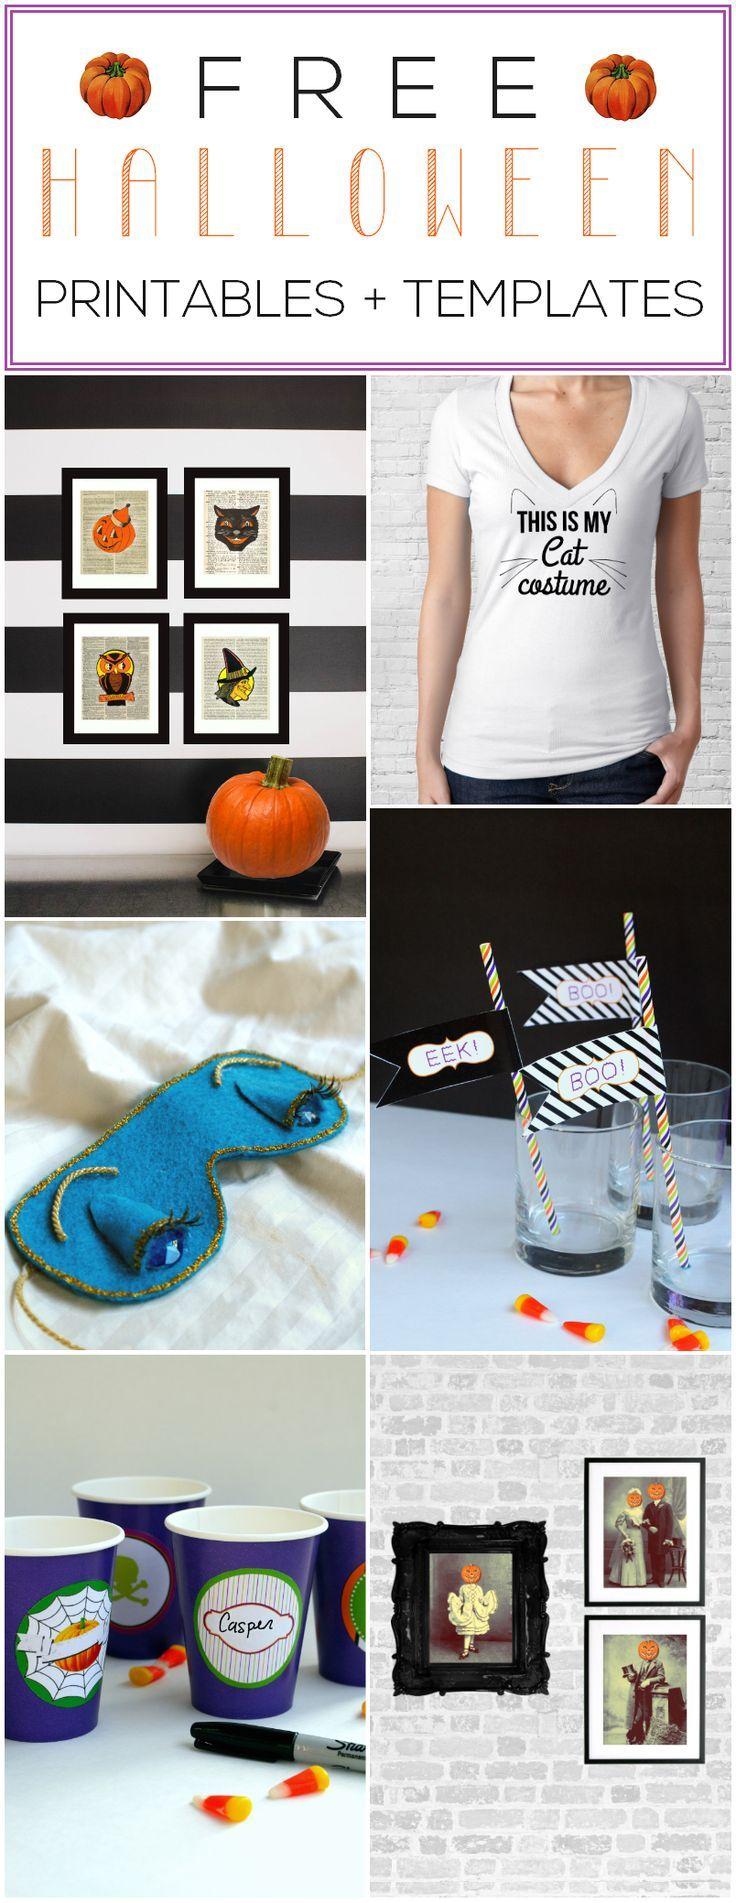 289 best Holidays | Happy Halloween images on Pinterest | Happy ...